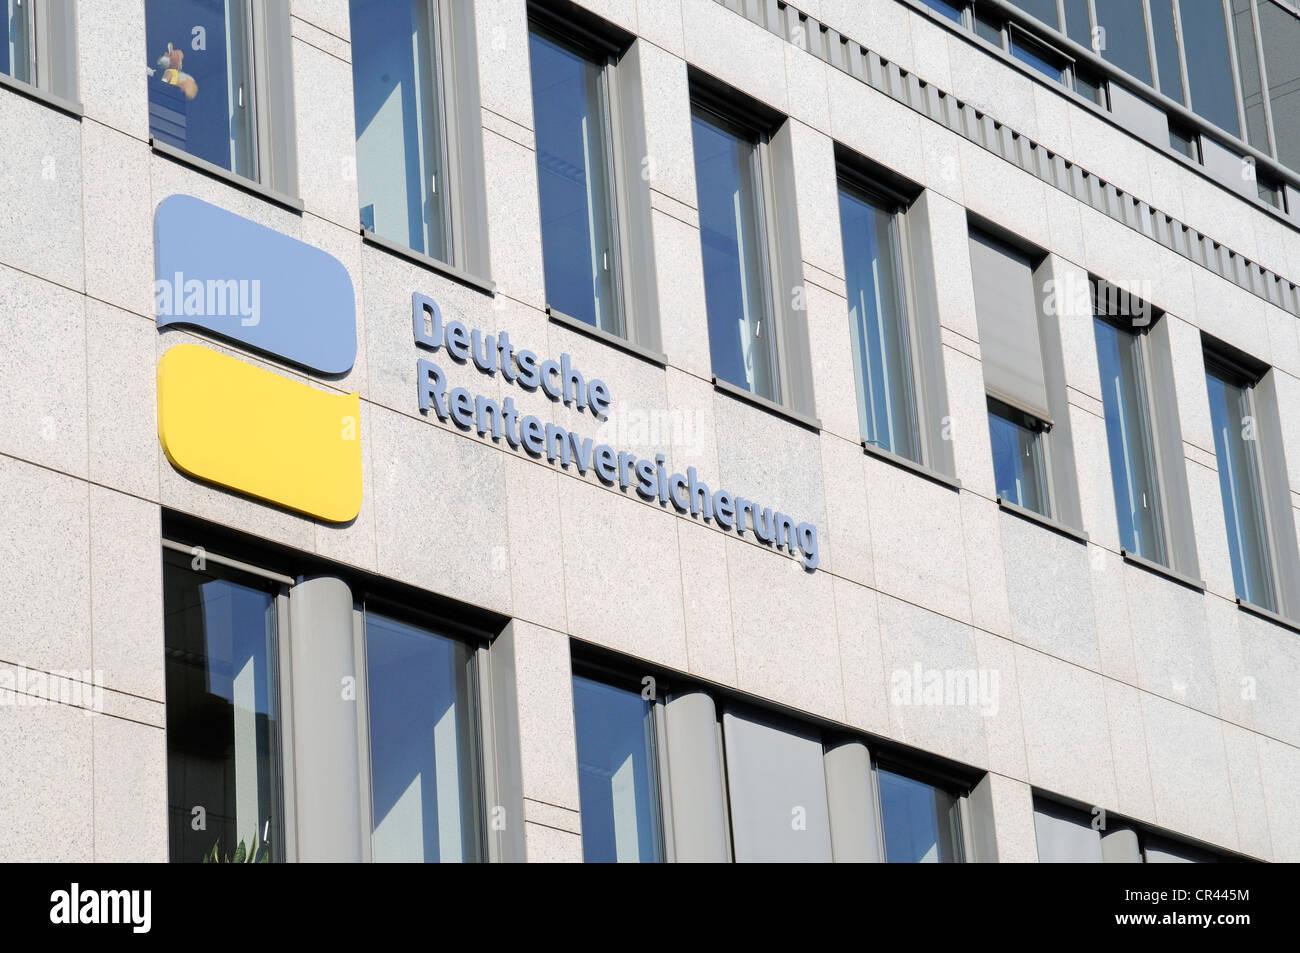 German pension insurance, Rhineland, Duisburg, Ruhrgebiet region, North Rhine-Westphalia, Germany, Europe Stock Photo